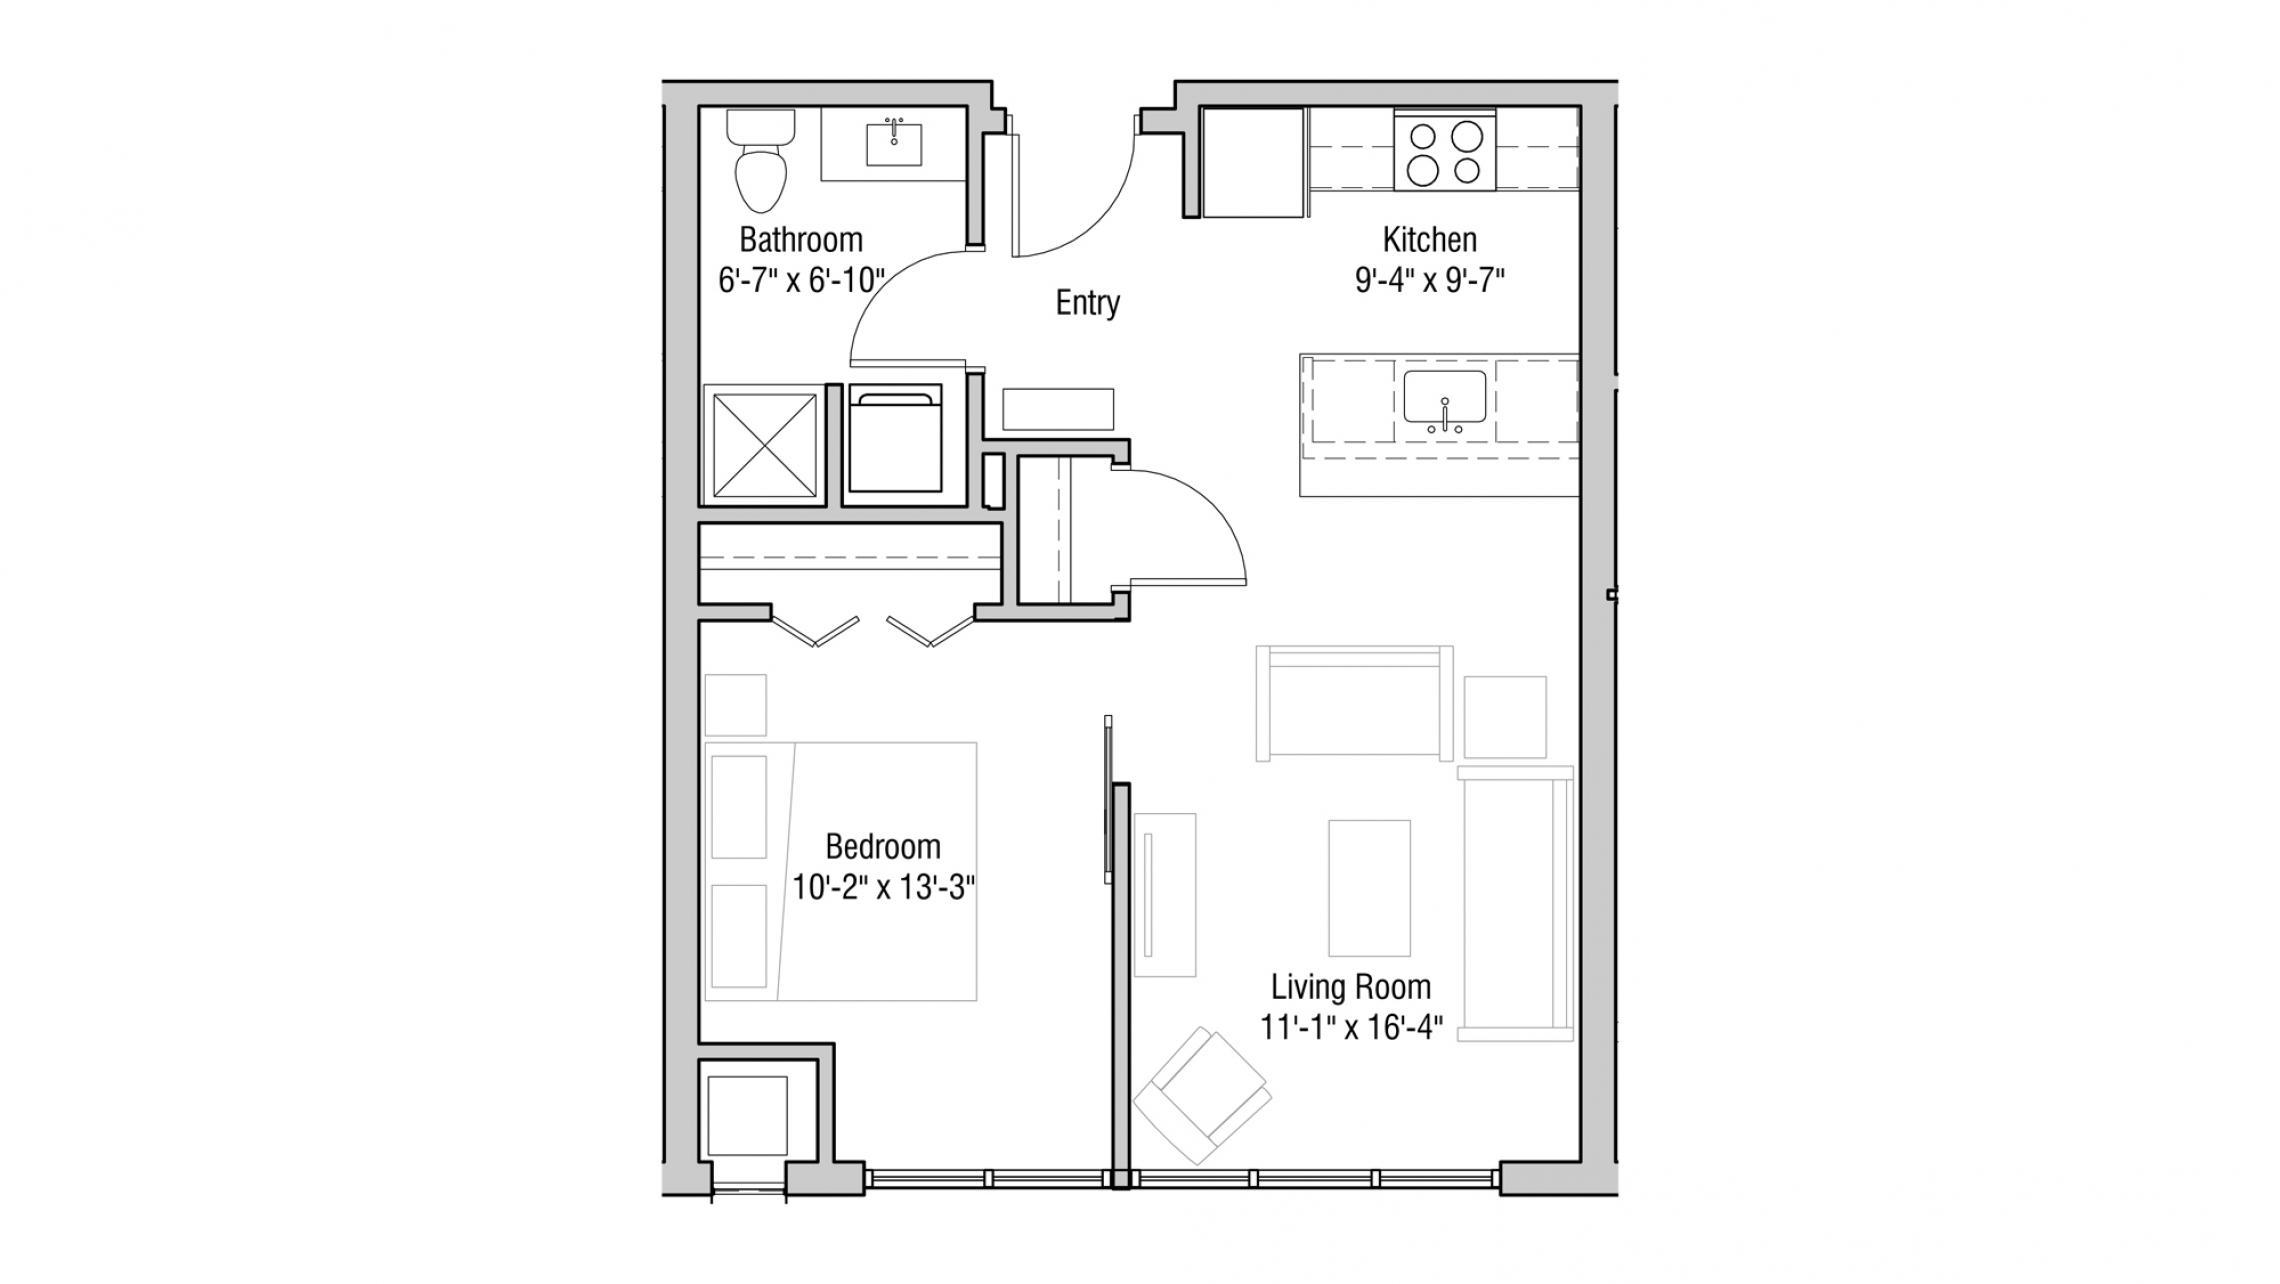 ULI Quarter Row 422 - One Bedroom, One Bathroom